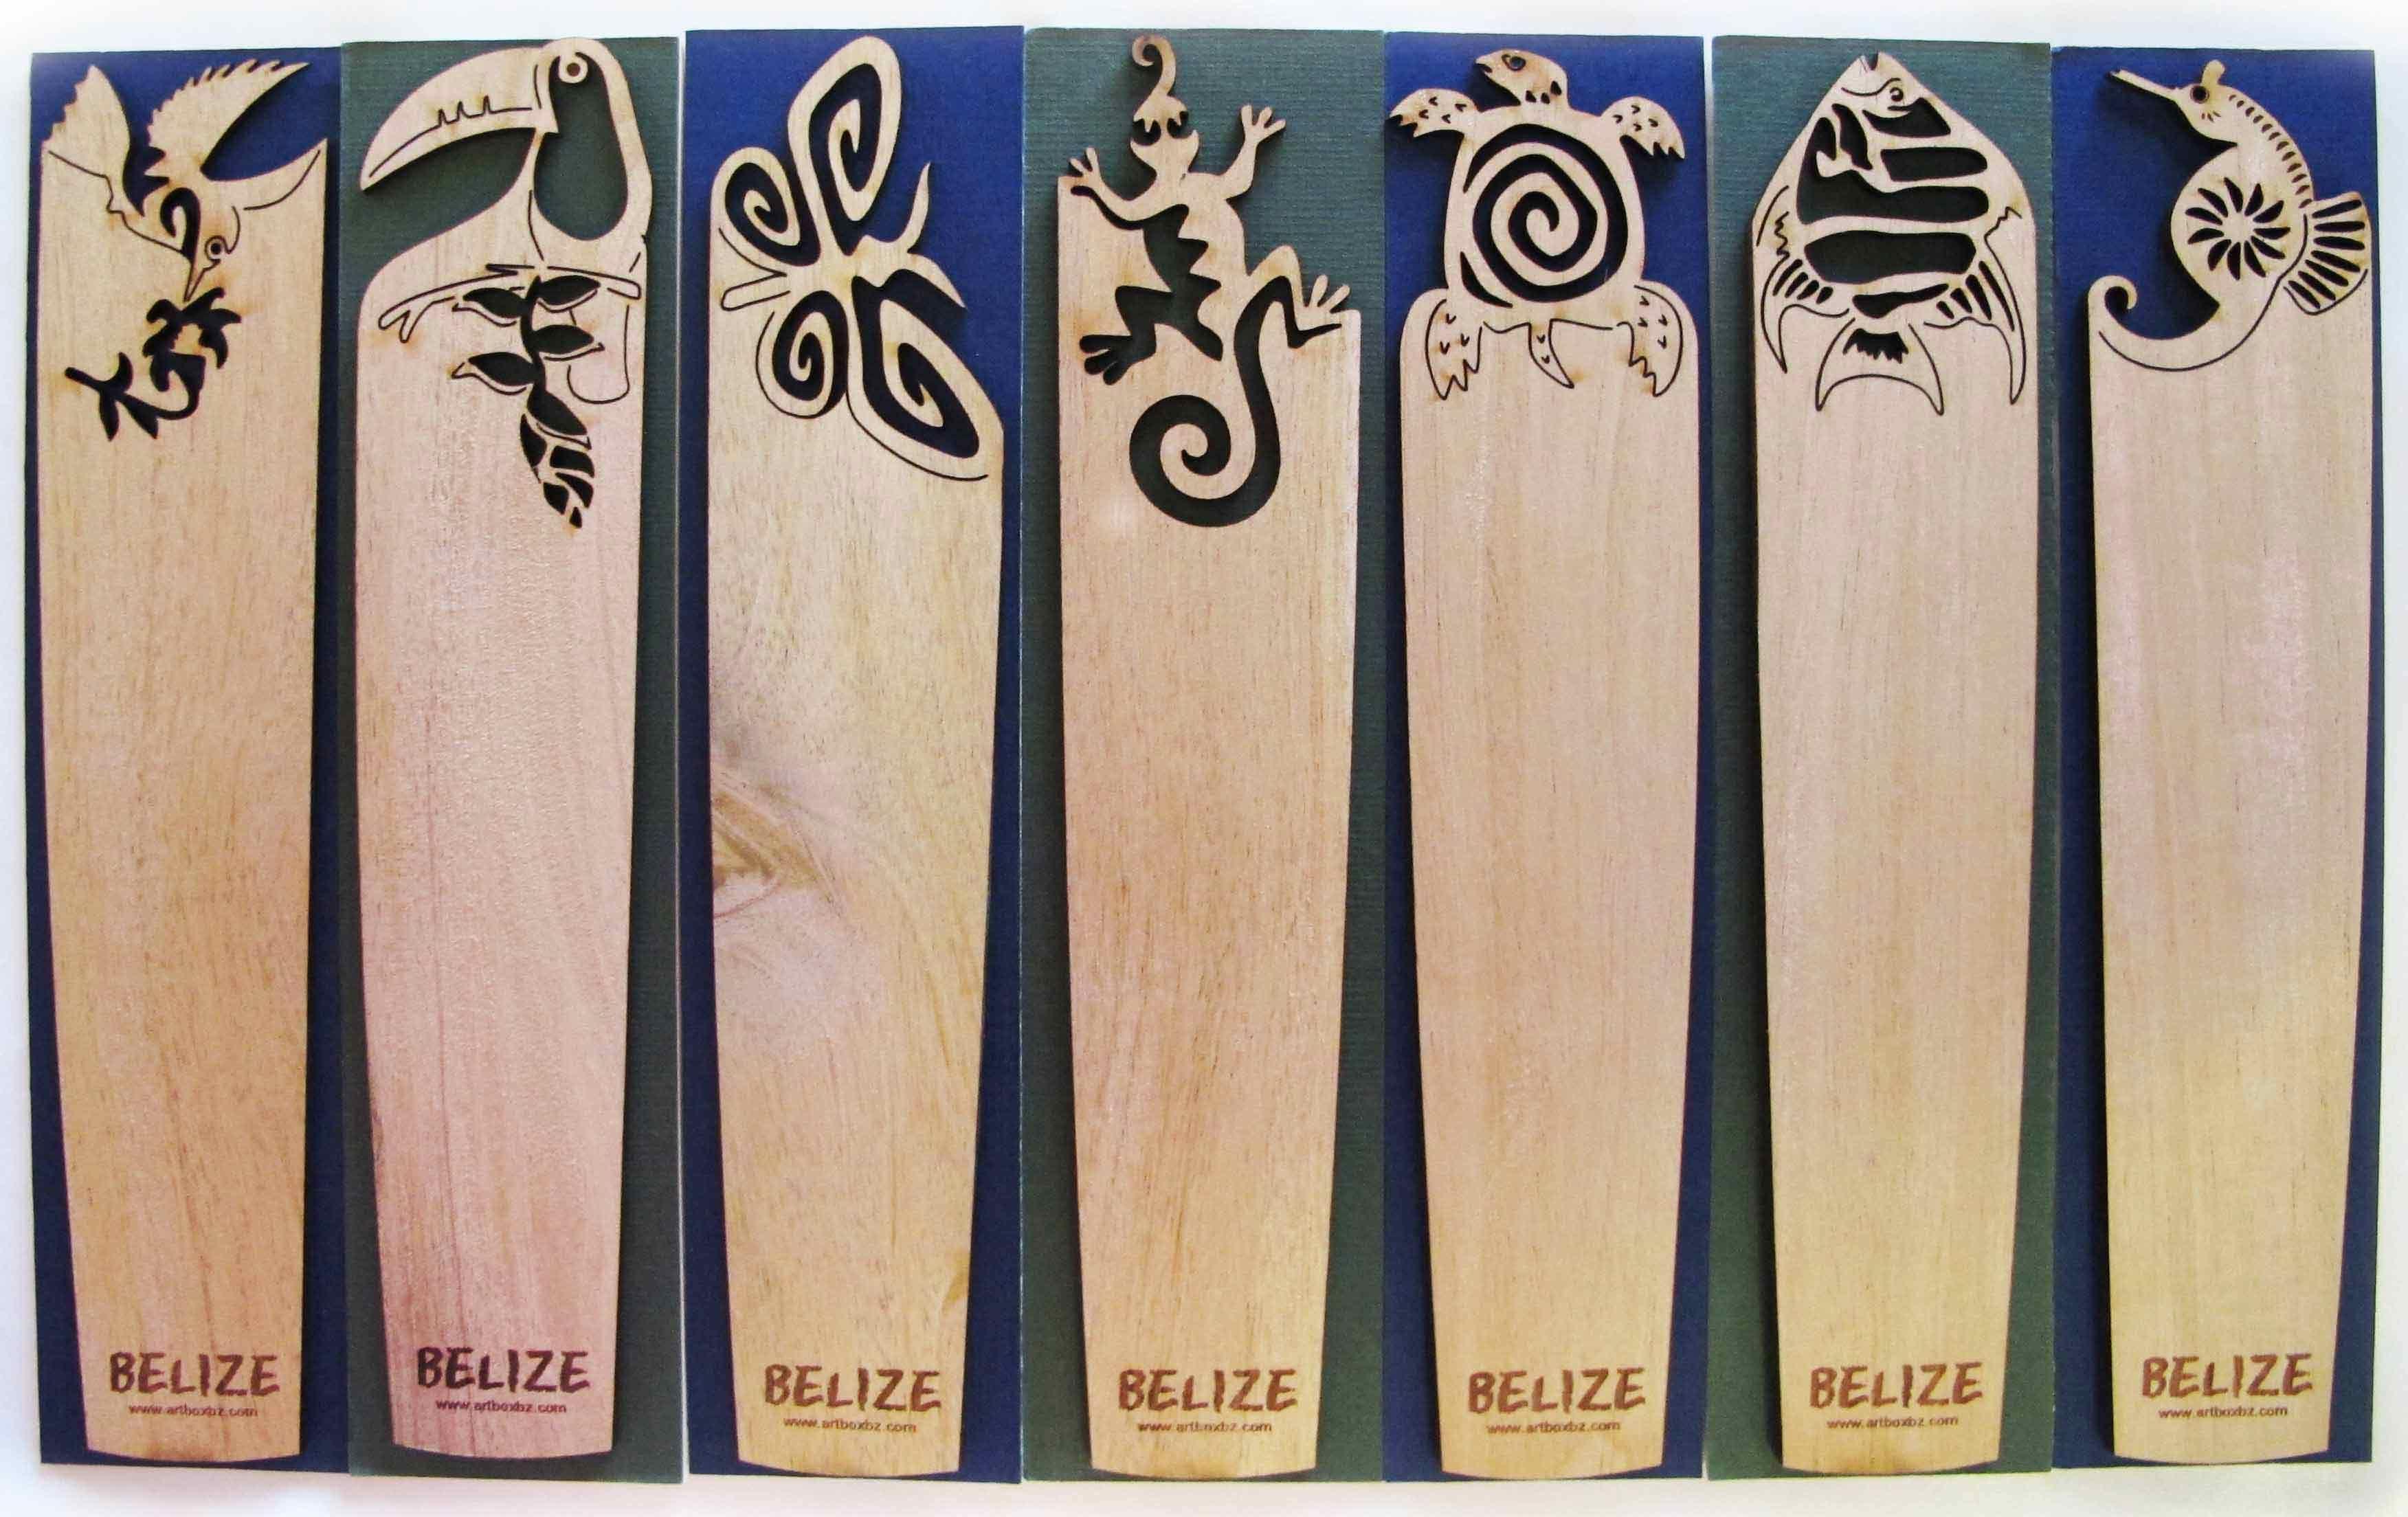 Engraved Wooden Bookmark J1 Book Markers Craft Stick Crafts Laser Cutter Ideas